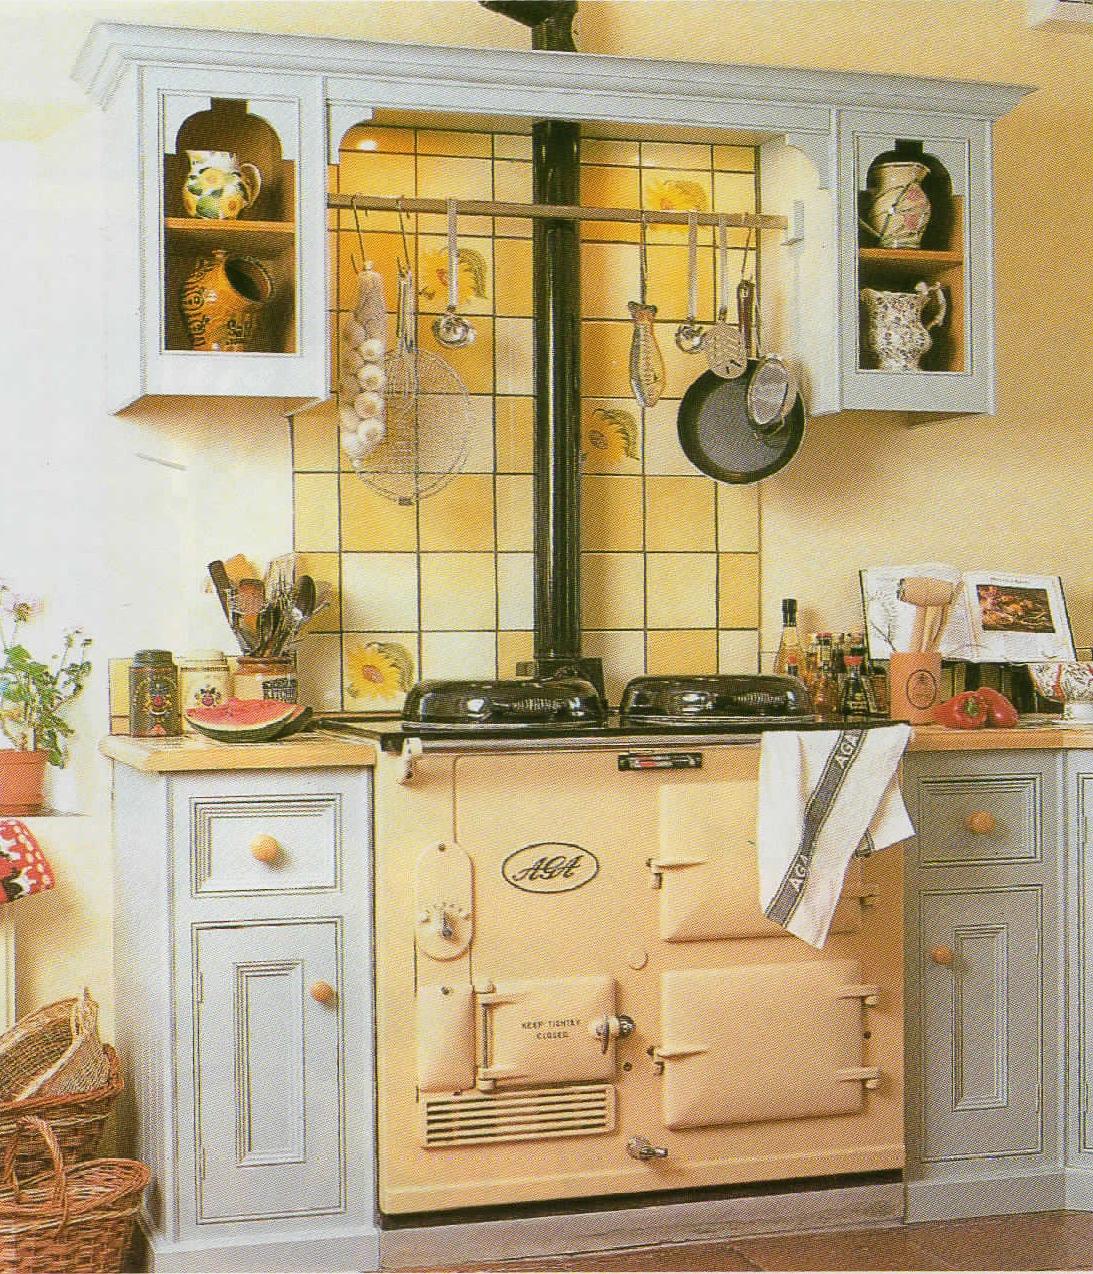 Baldosas rustica cocina for Baldosas rusticas